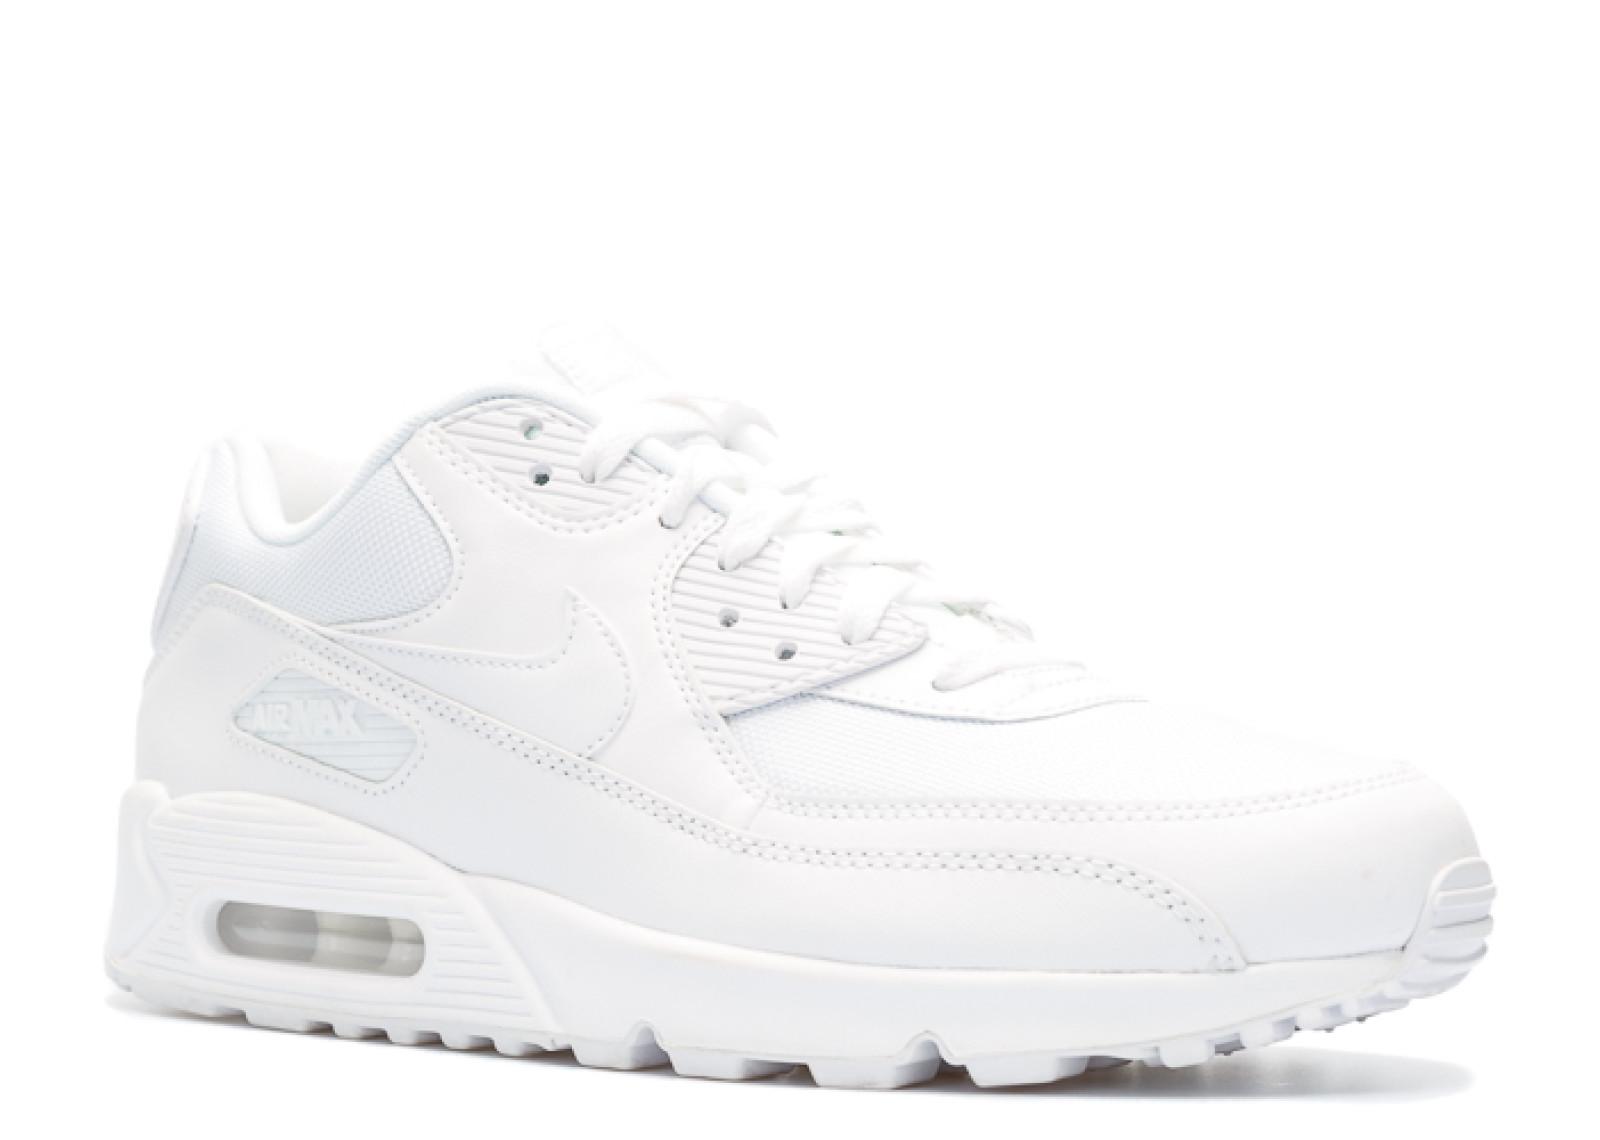 new style 3aad3 bb164 Nike Air Max 90 Triple White - 1